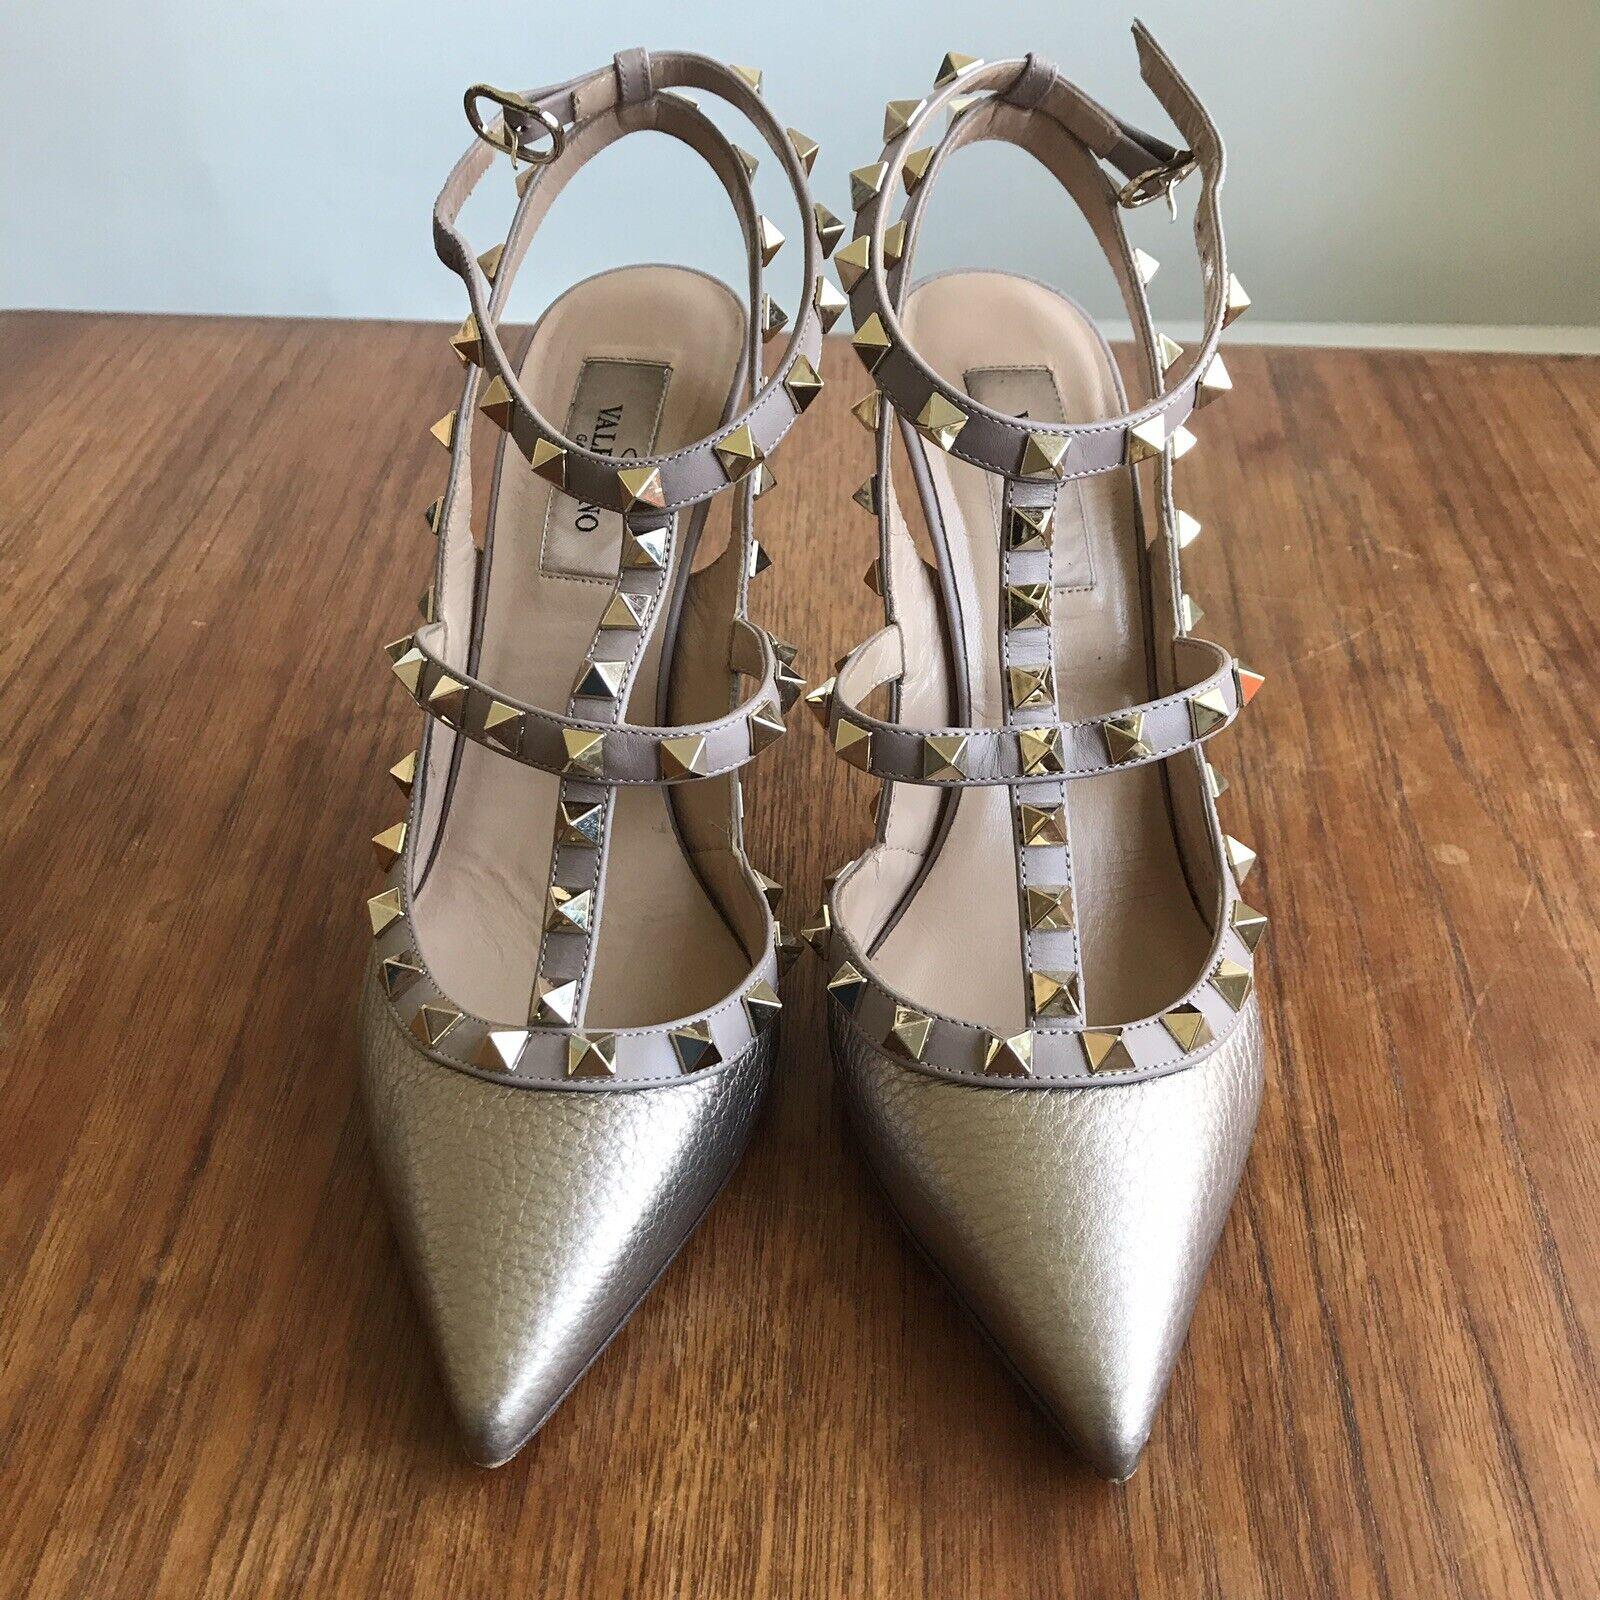 Valentino Rockstud Heels - gold. Worn Twice. Size 37.5 UK 4.5